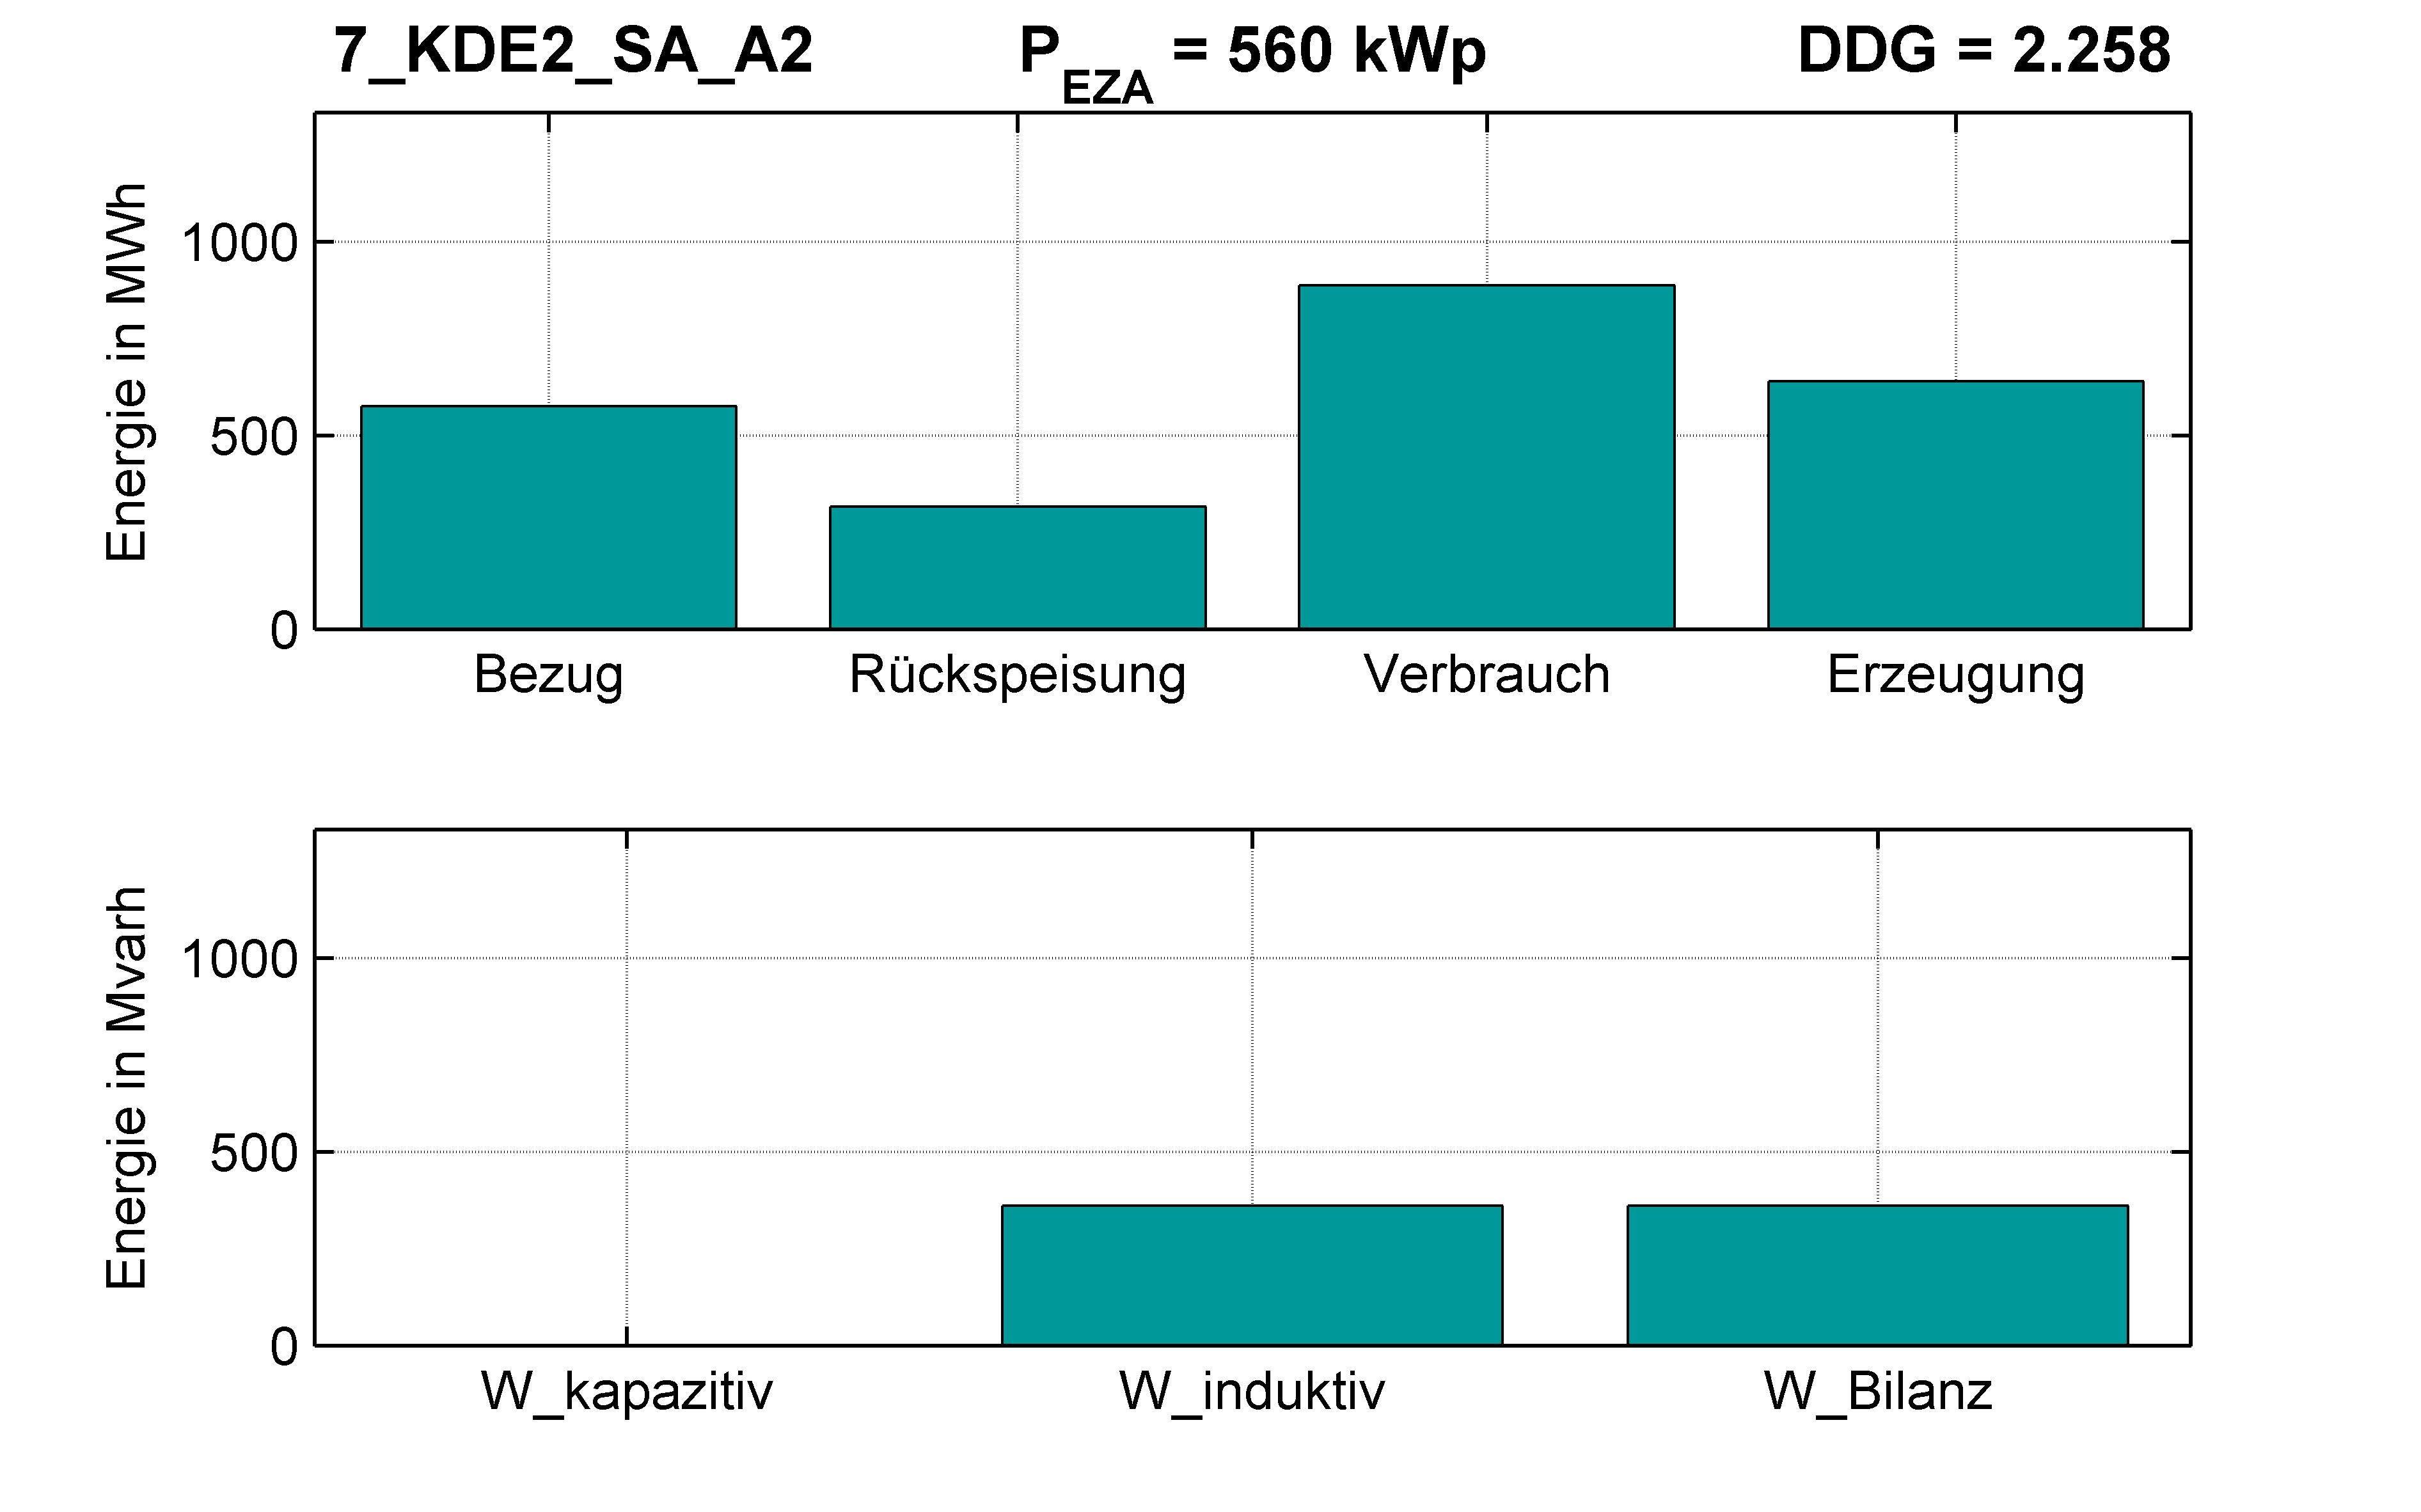 KDE2 | Längsregler (SA) A2 | PQ-Bilanz